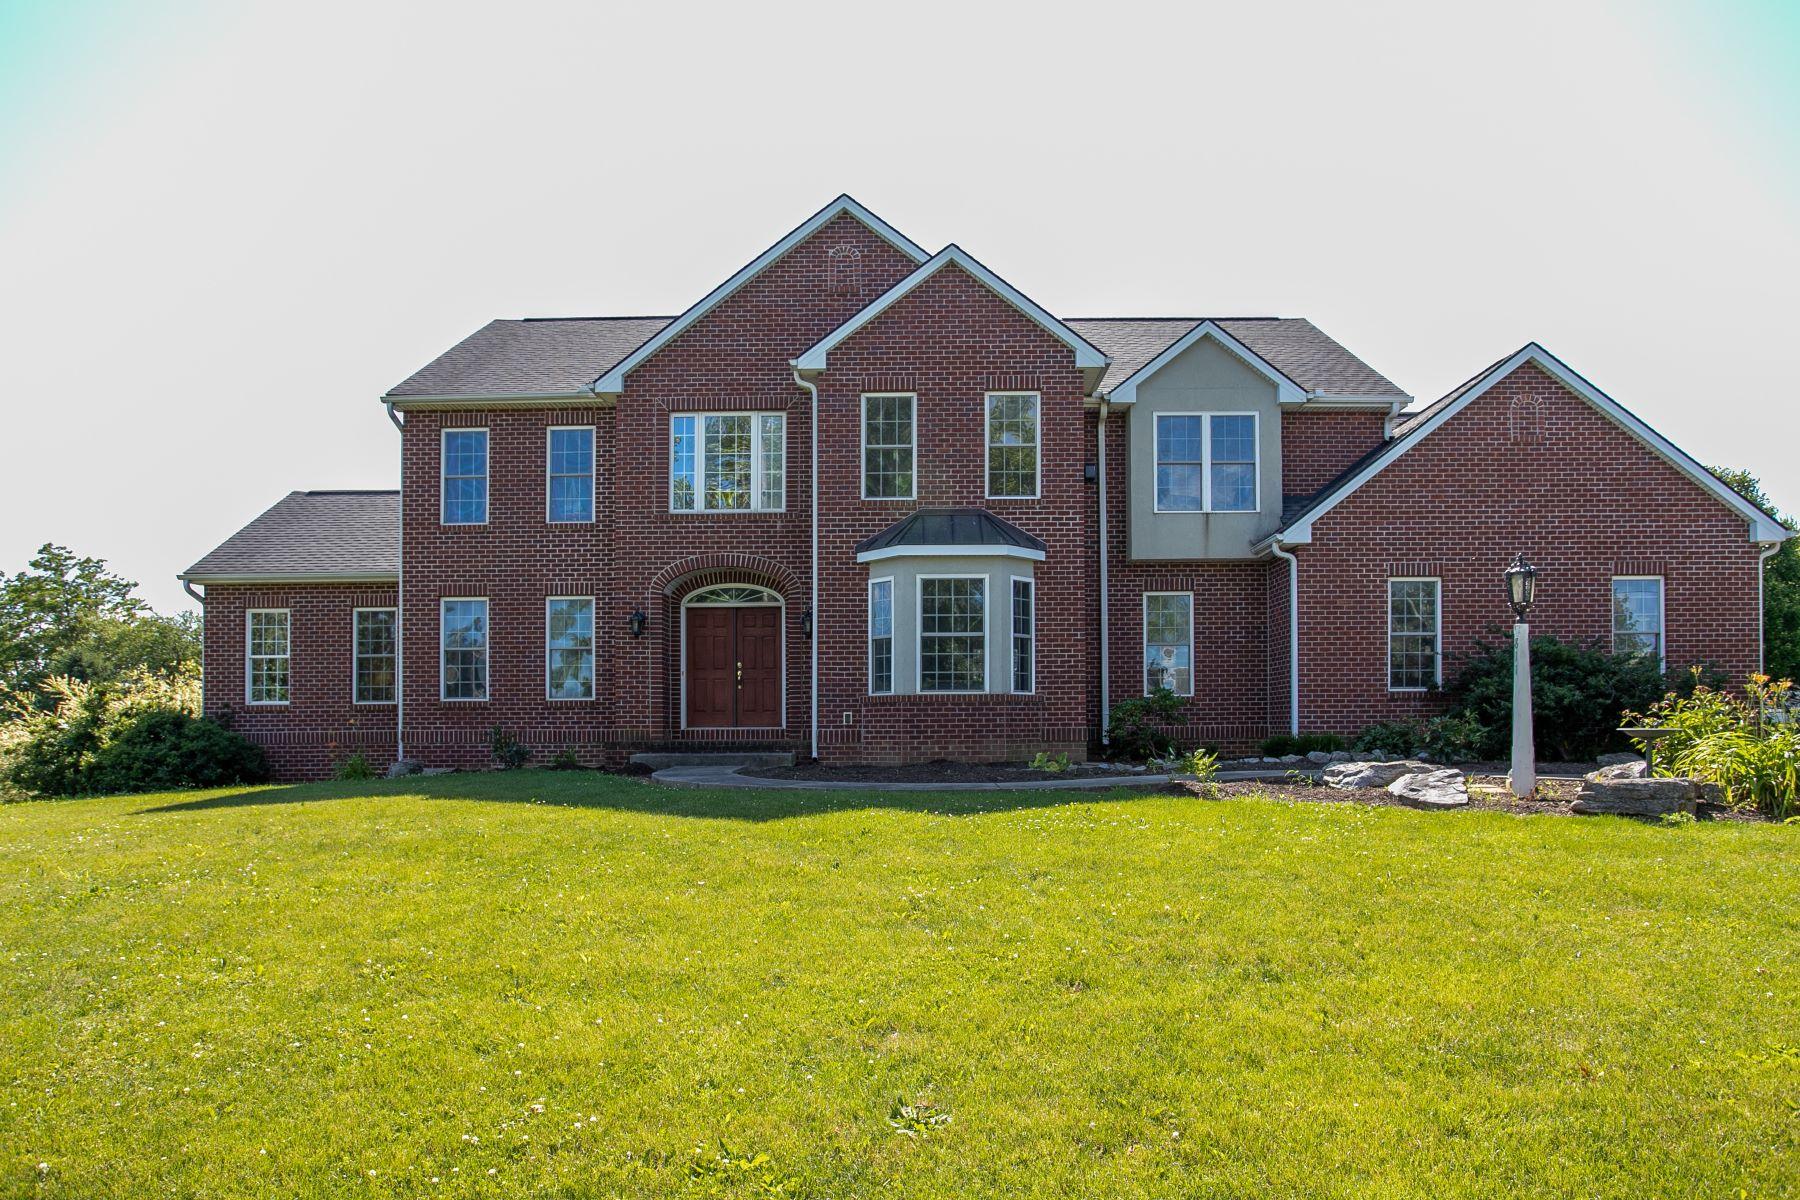 Single Family Homes για την Πώληση στο Leola, Πενσιλβανια 17540 Ηνωμένες Πολιτείες